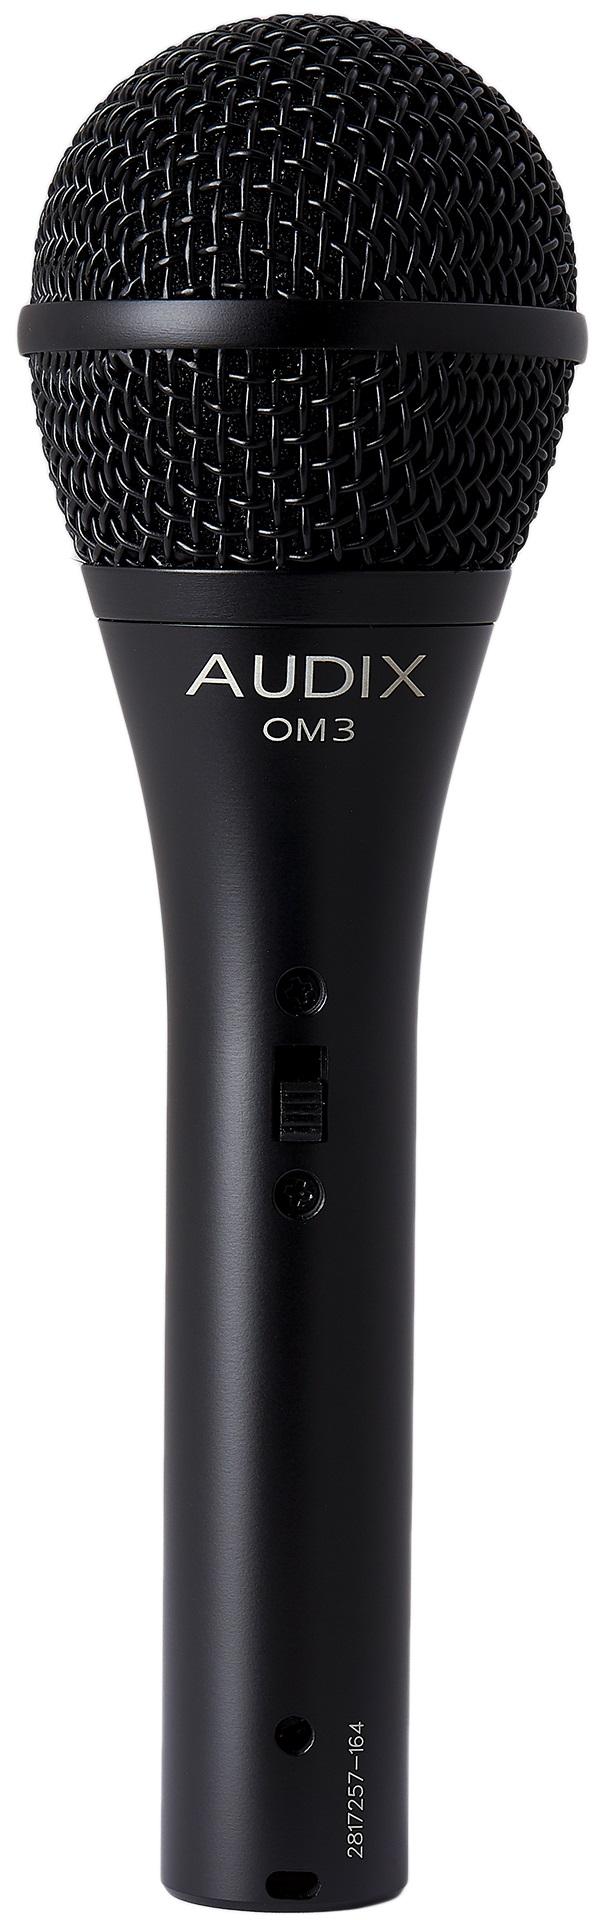 Audix OM3-s